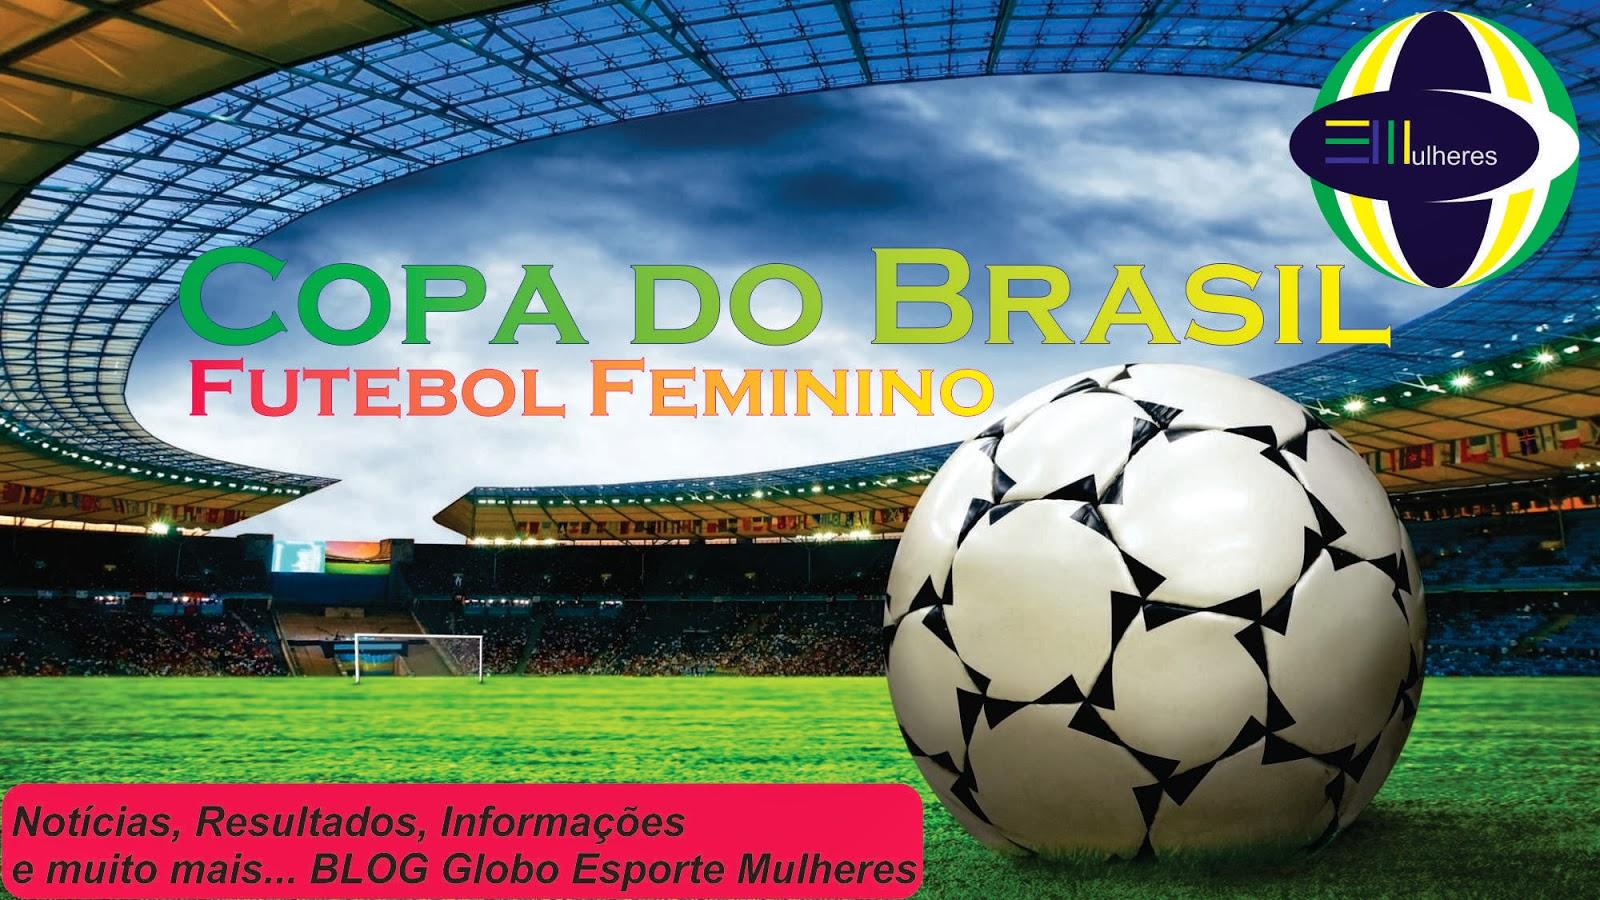 41f8178b92 Globo Esporte Mulheres  Janeiro 2014